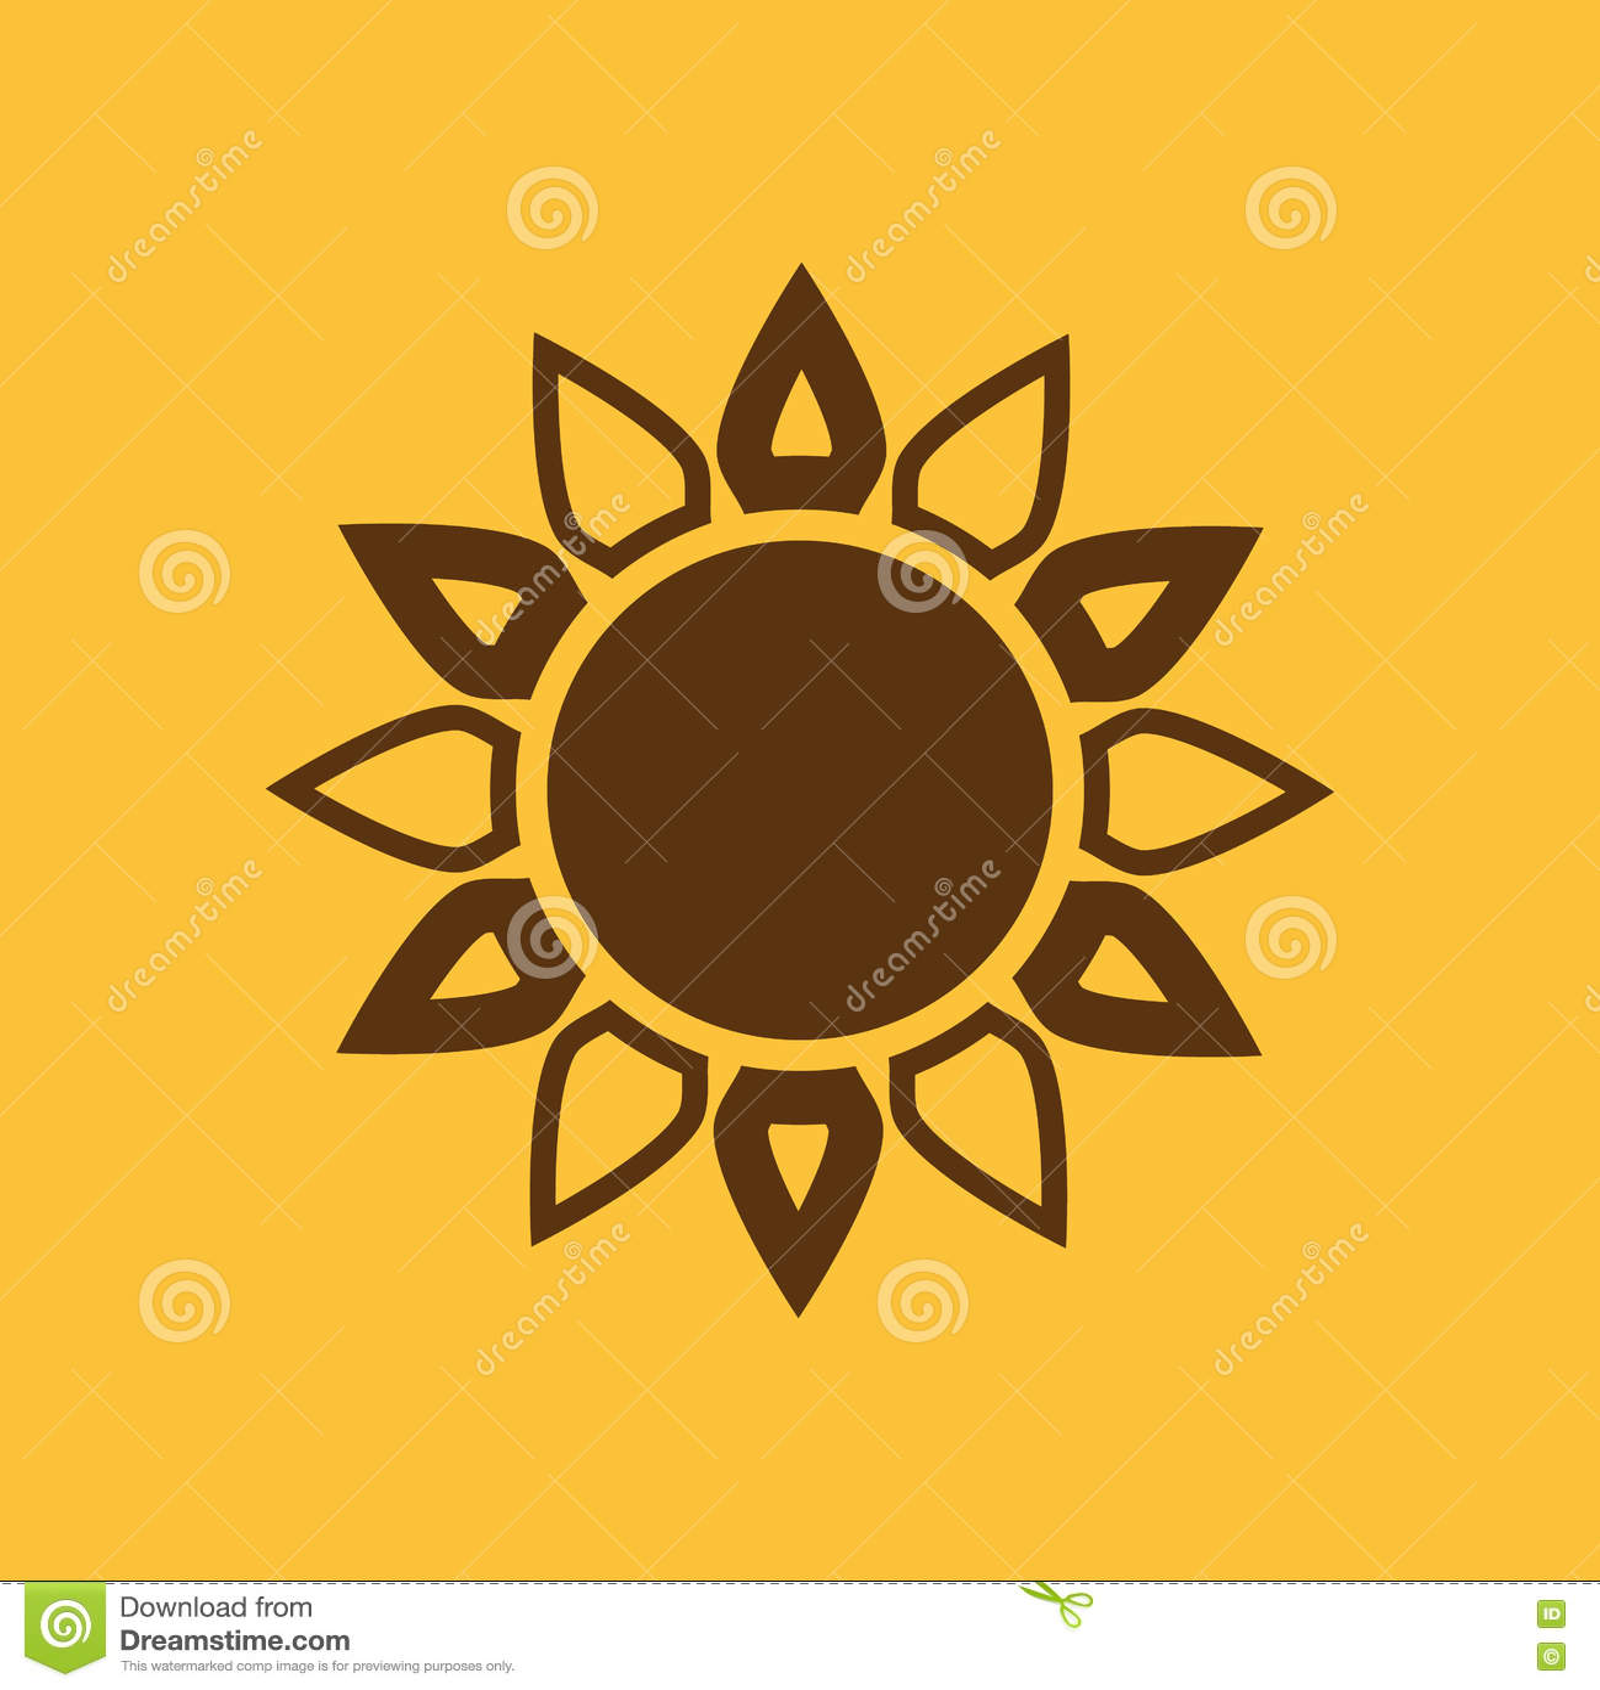 The Weather Icon  Sunrise And Sunshine, Weather, Sun Symbol